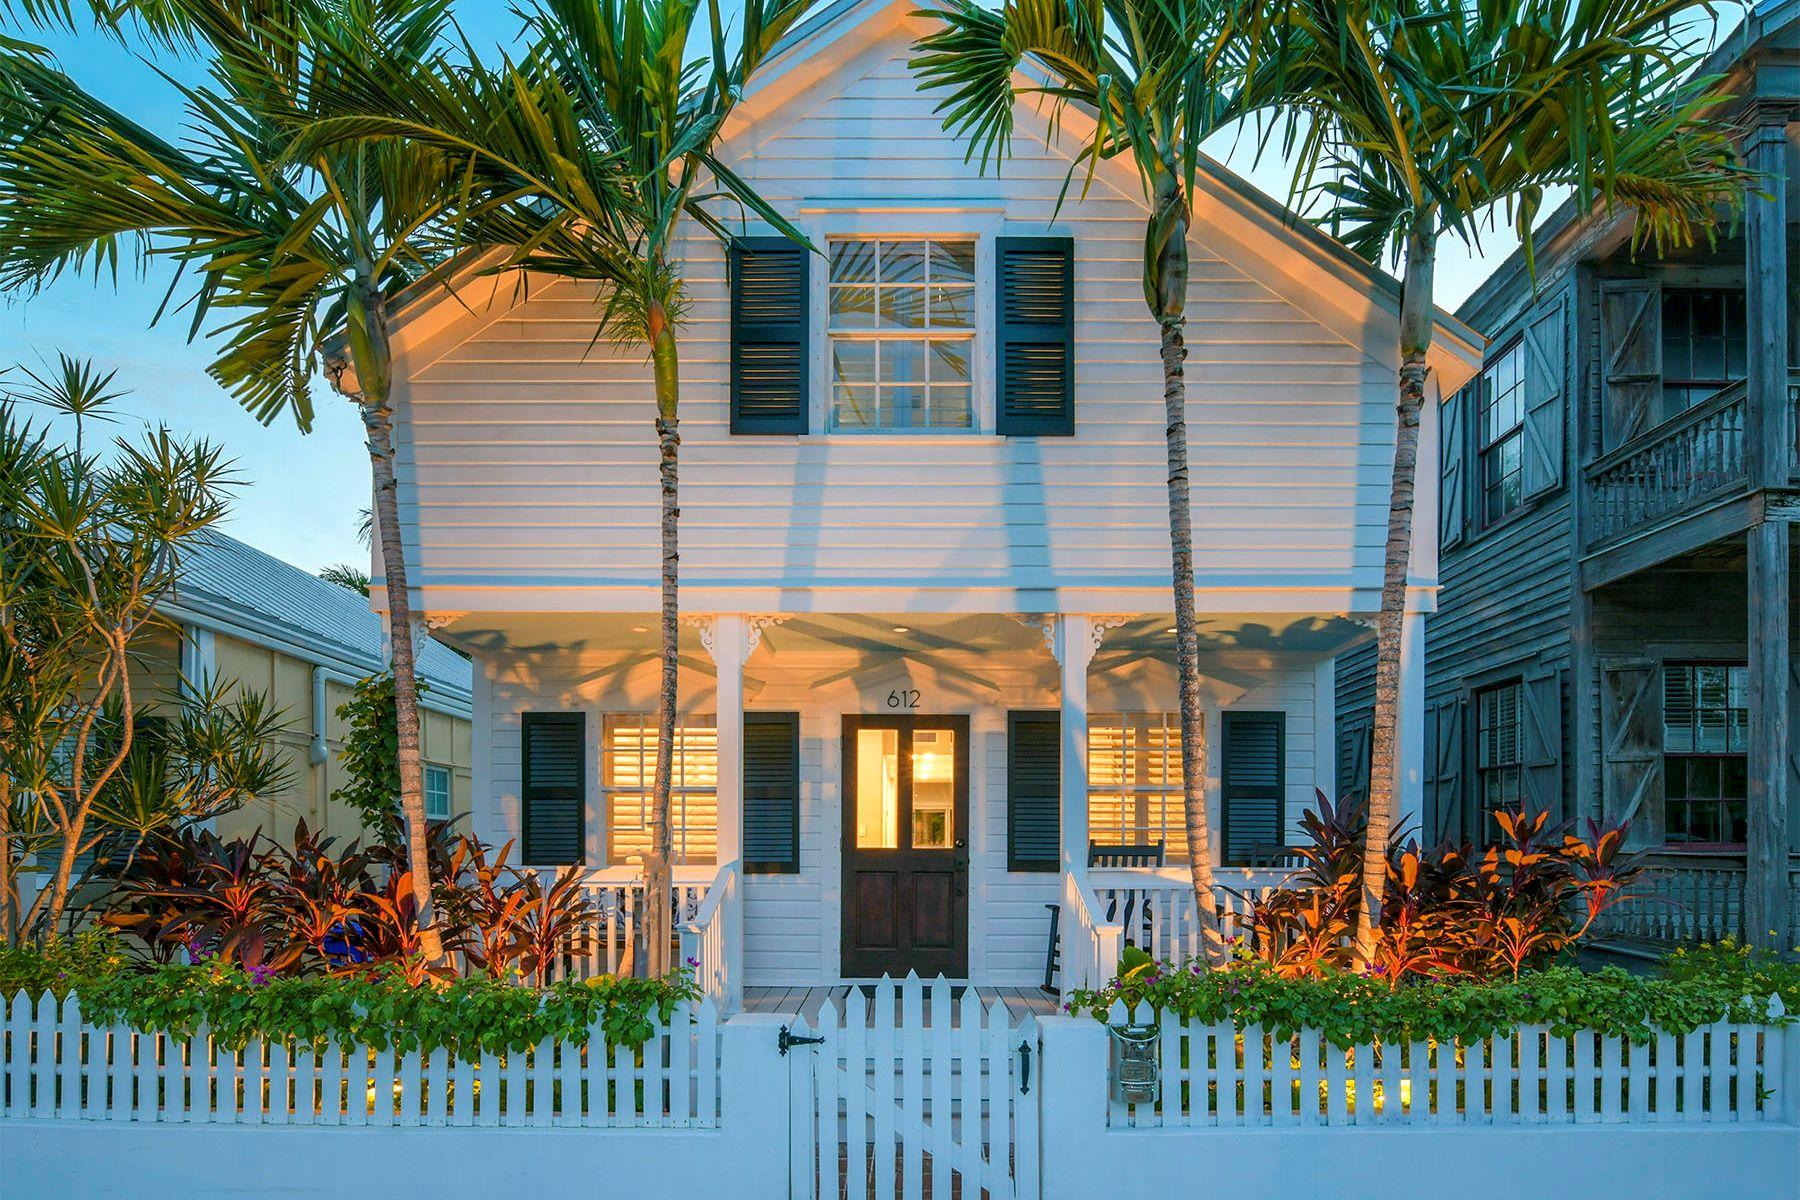 Single Family Homes для того Продажа на 612 White Street, Key West, FL Key West, Флорида 33040 Соединенные Штаты